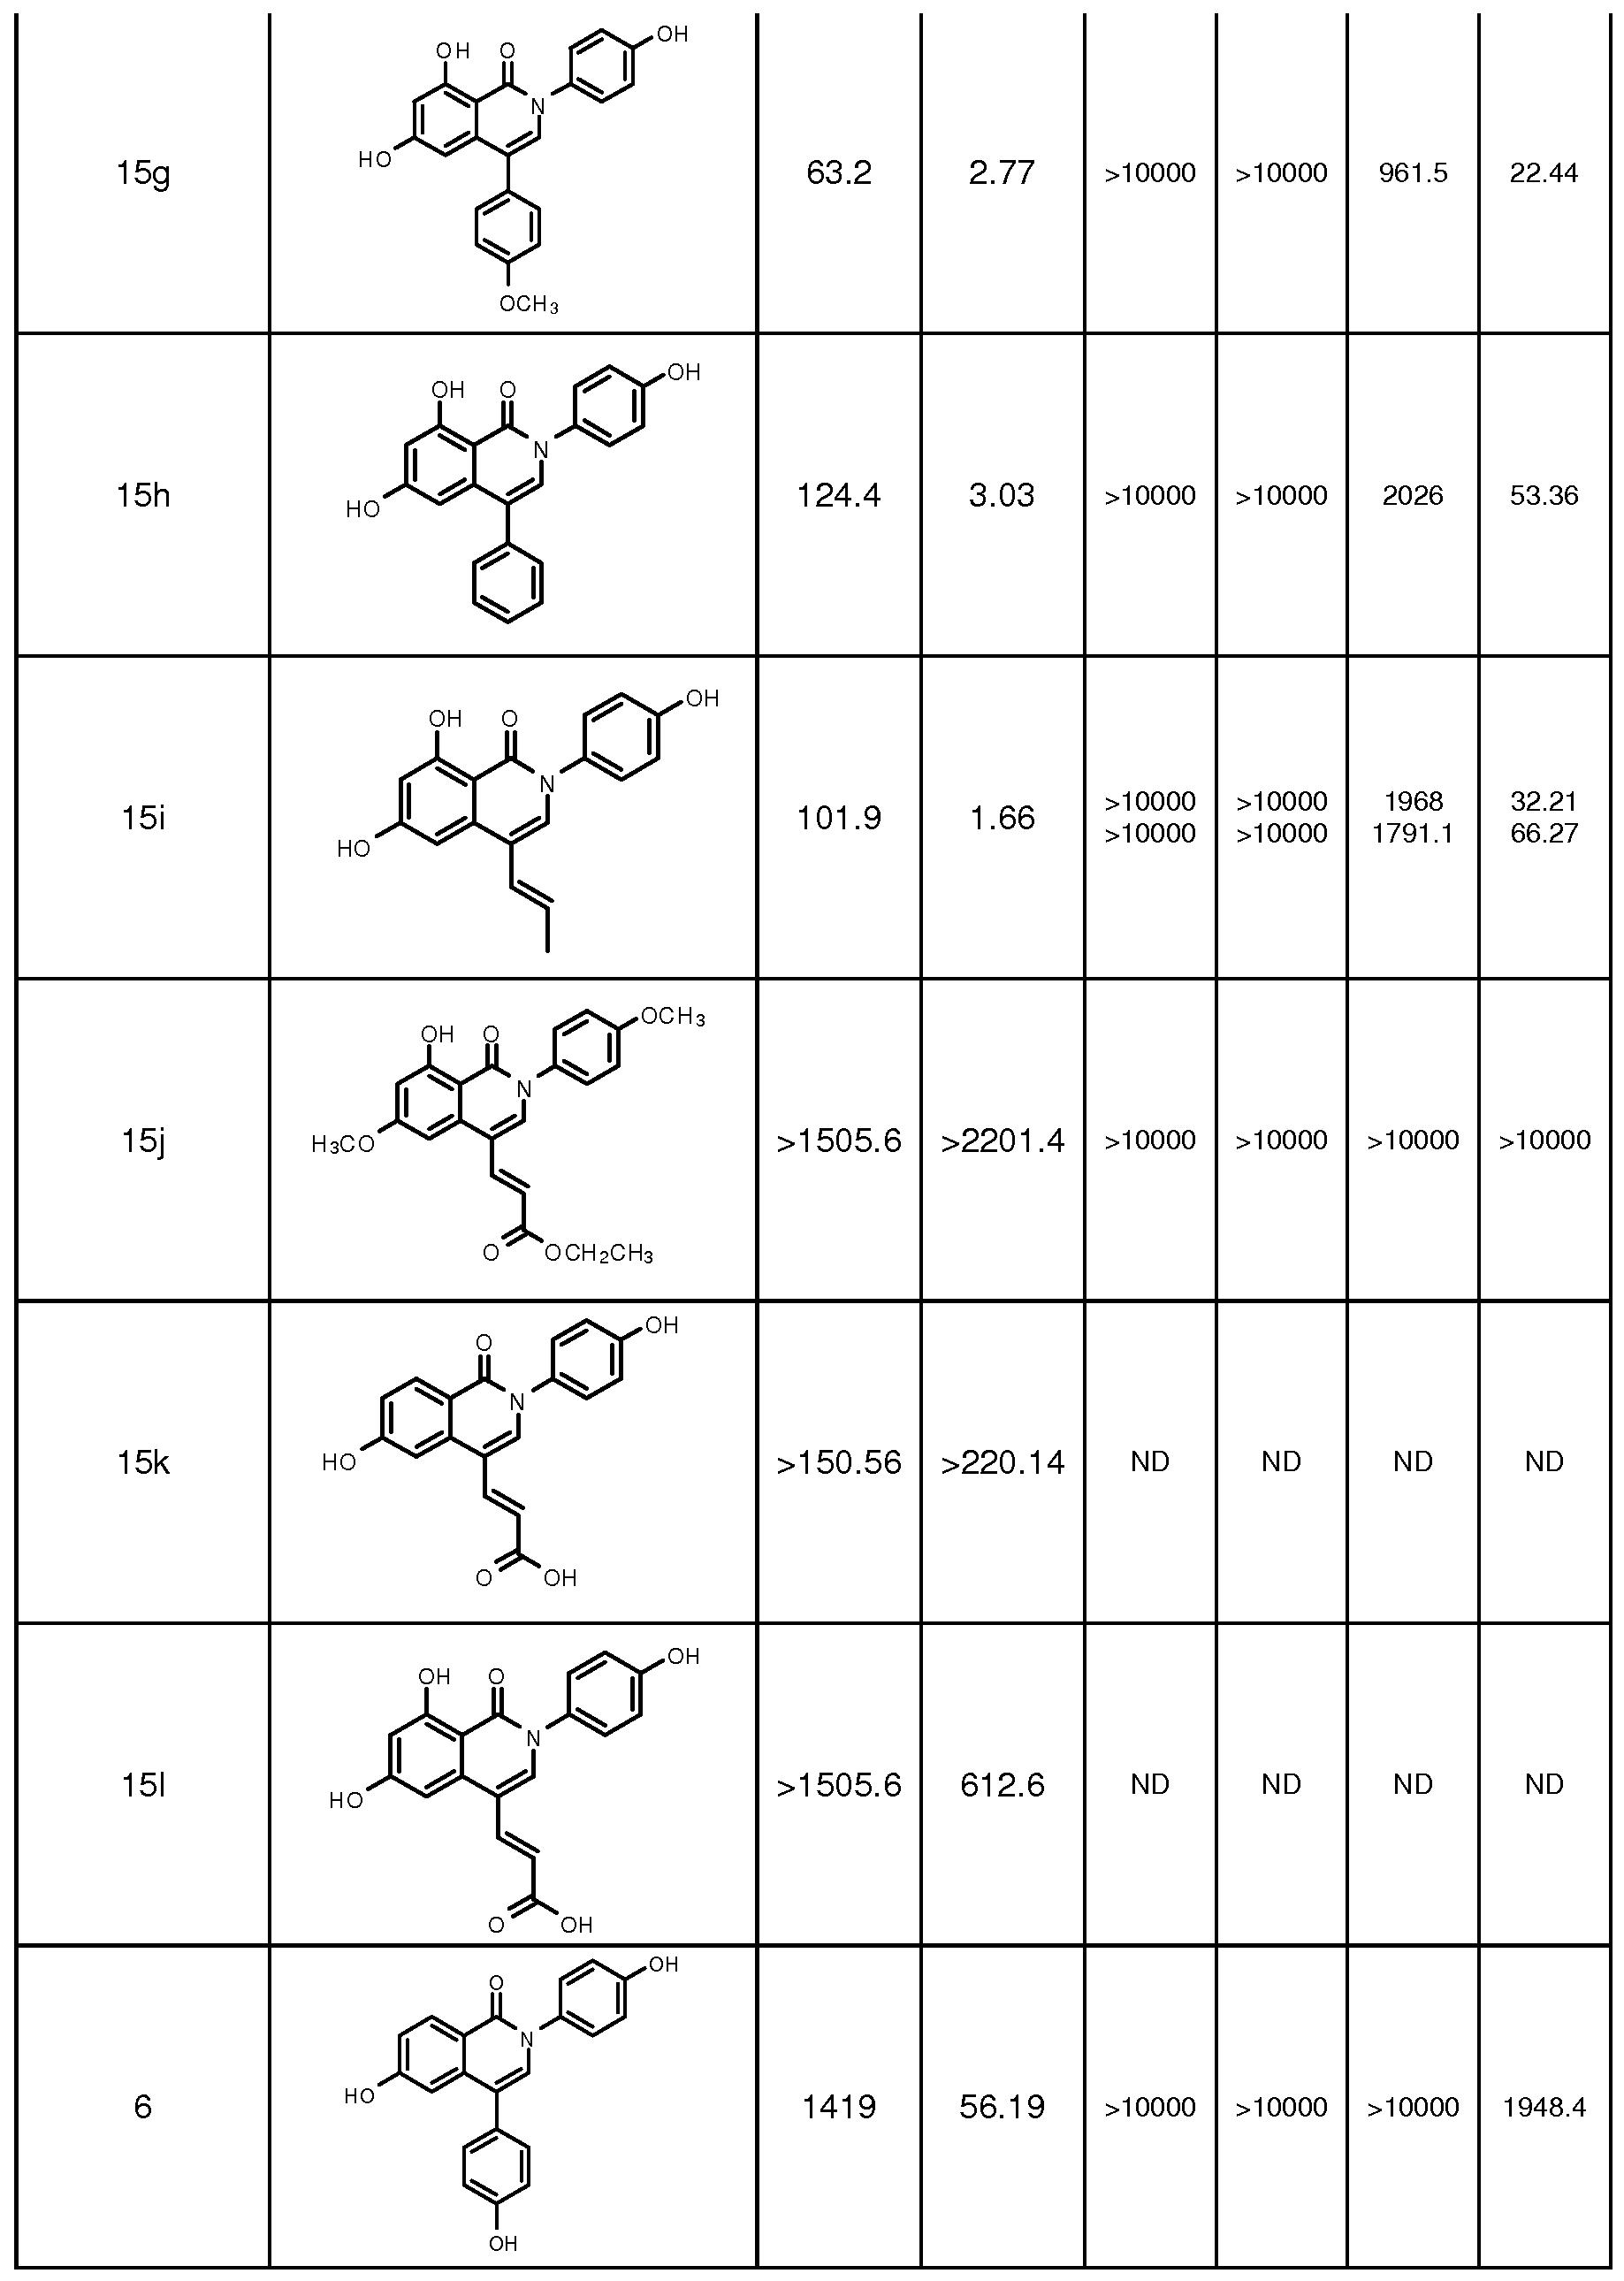 WO A1 Aldo keto reductase subfamily 1c3 akr1c3 inhibitors Google Patents